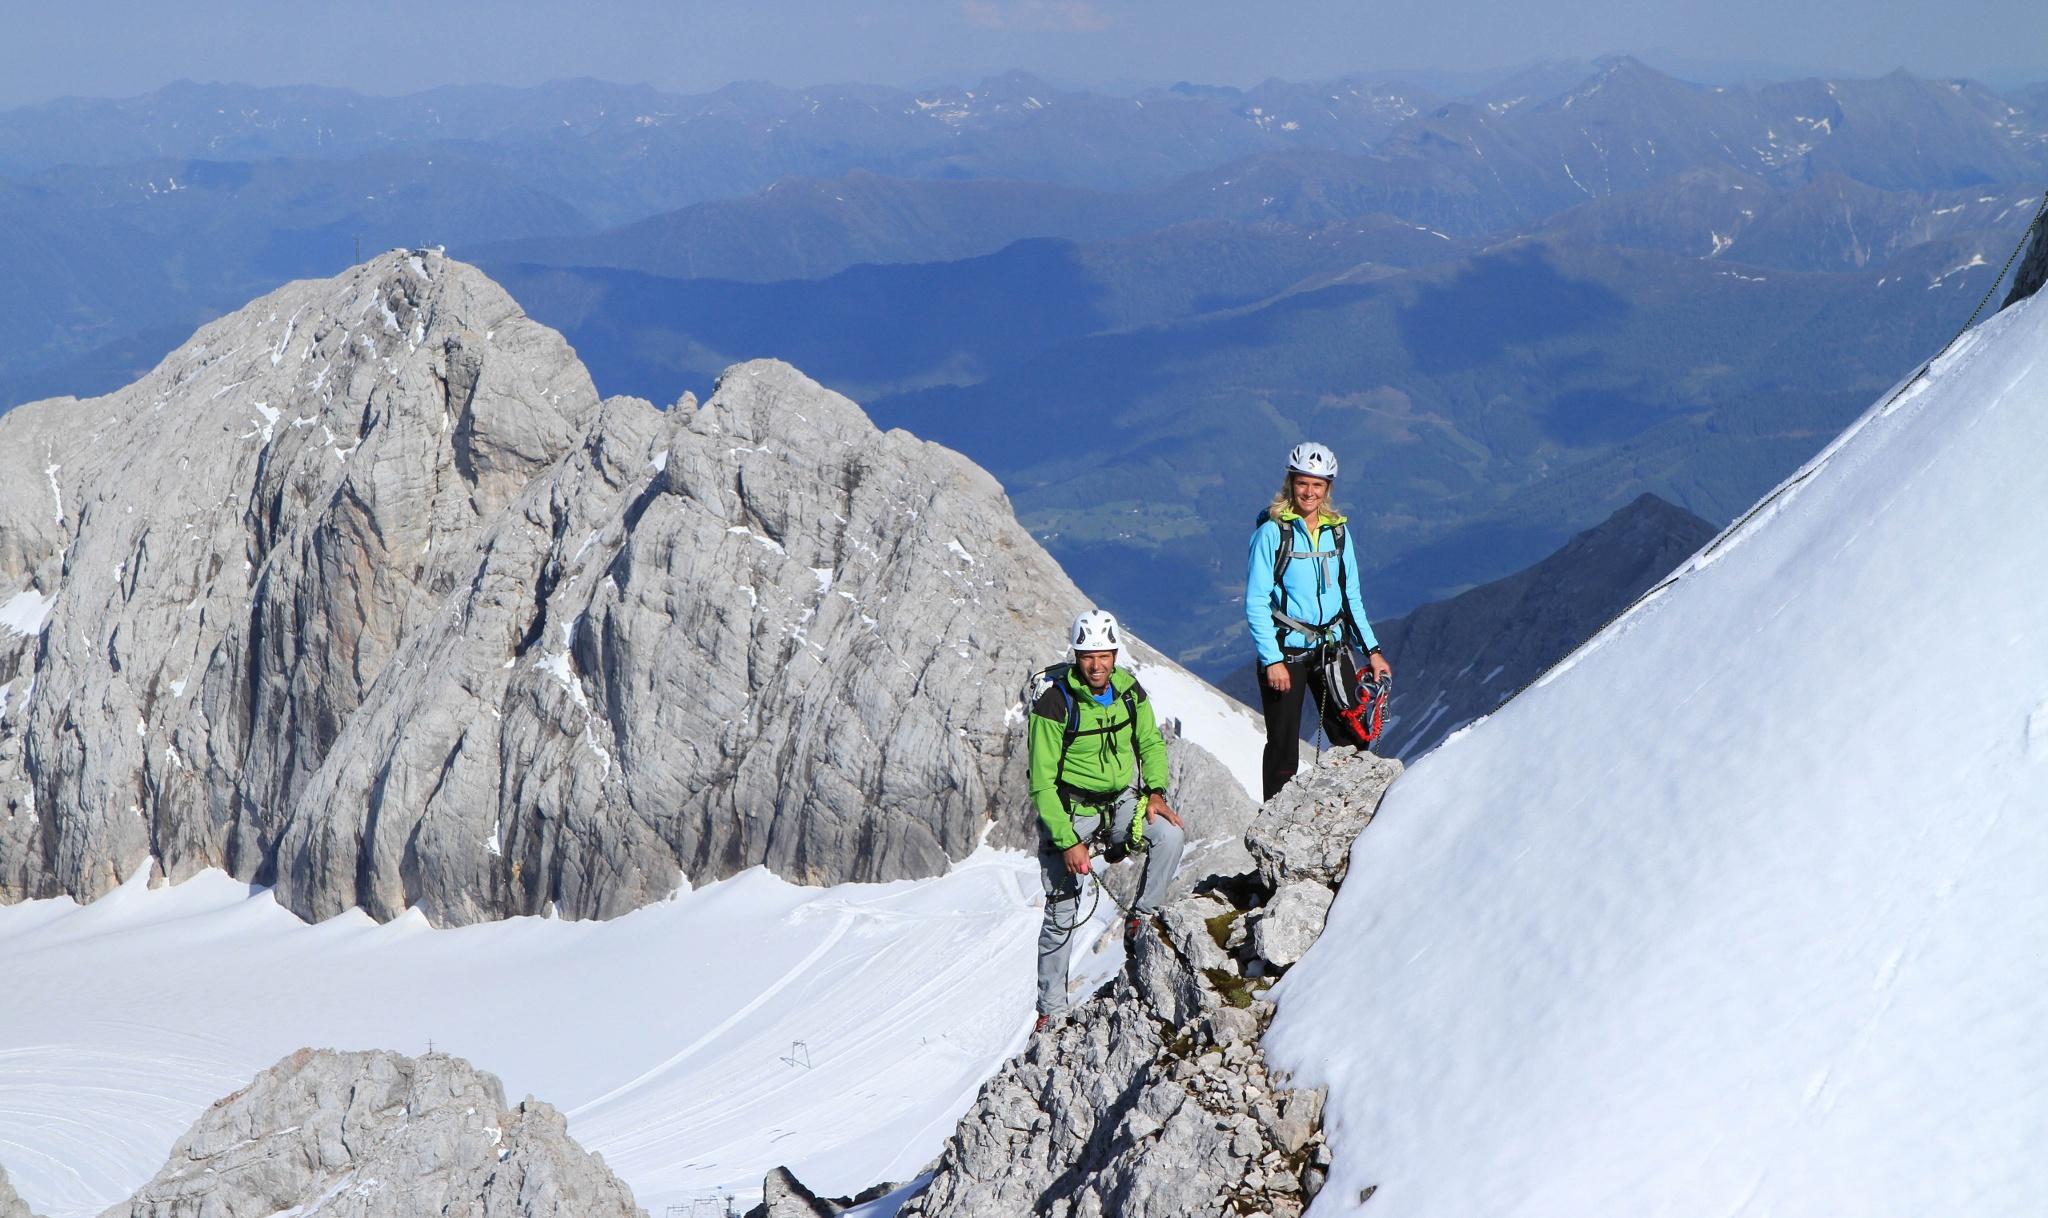 Klettersteig Ramsau : Klettersteig ramsau stockfoto bildagentur panthermedia